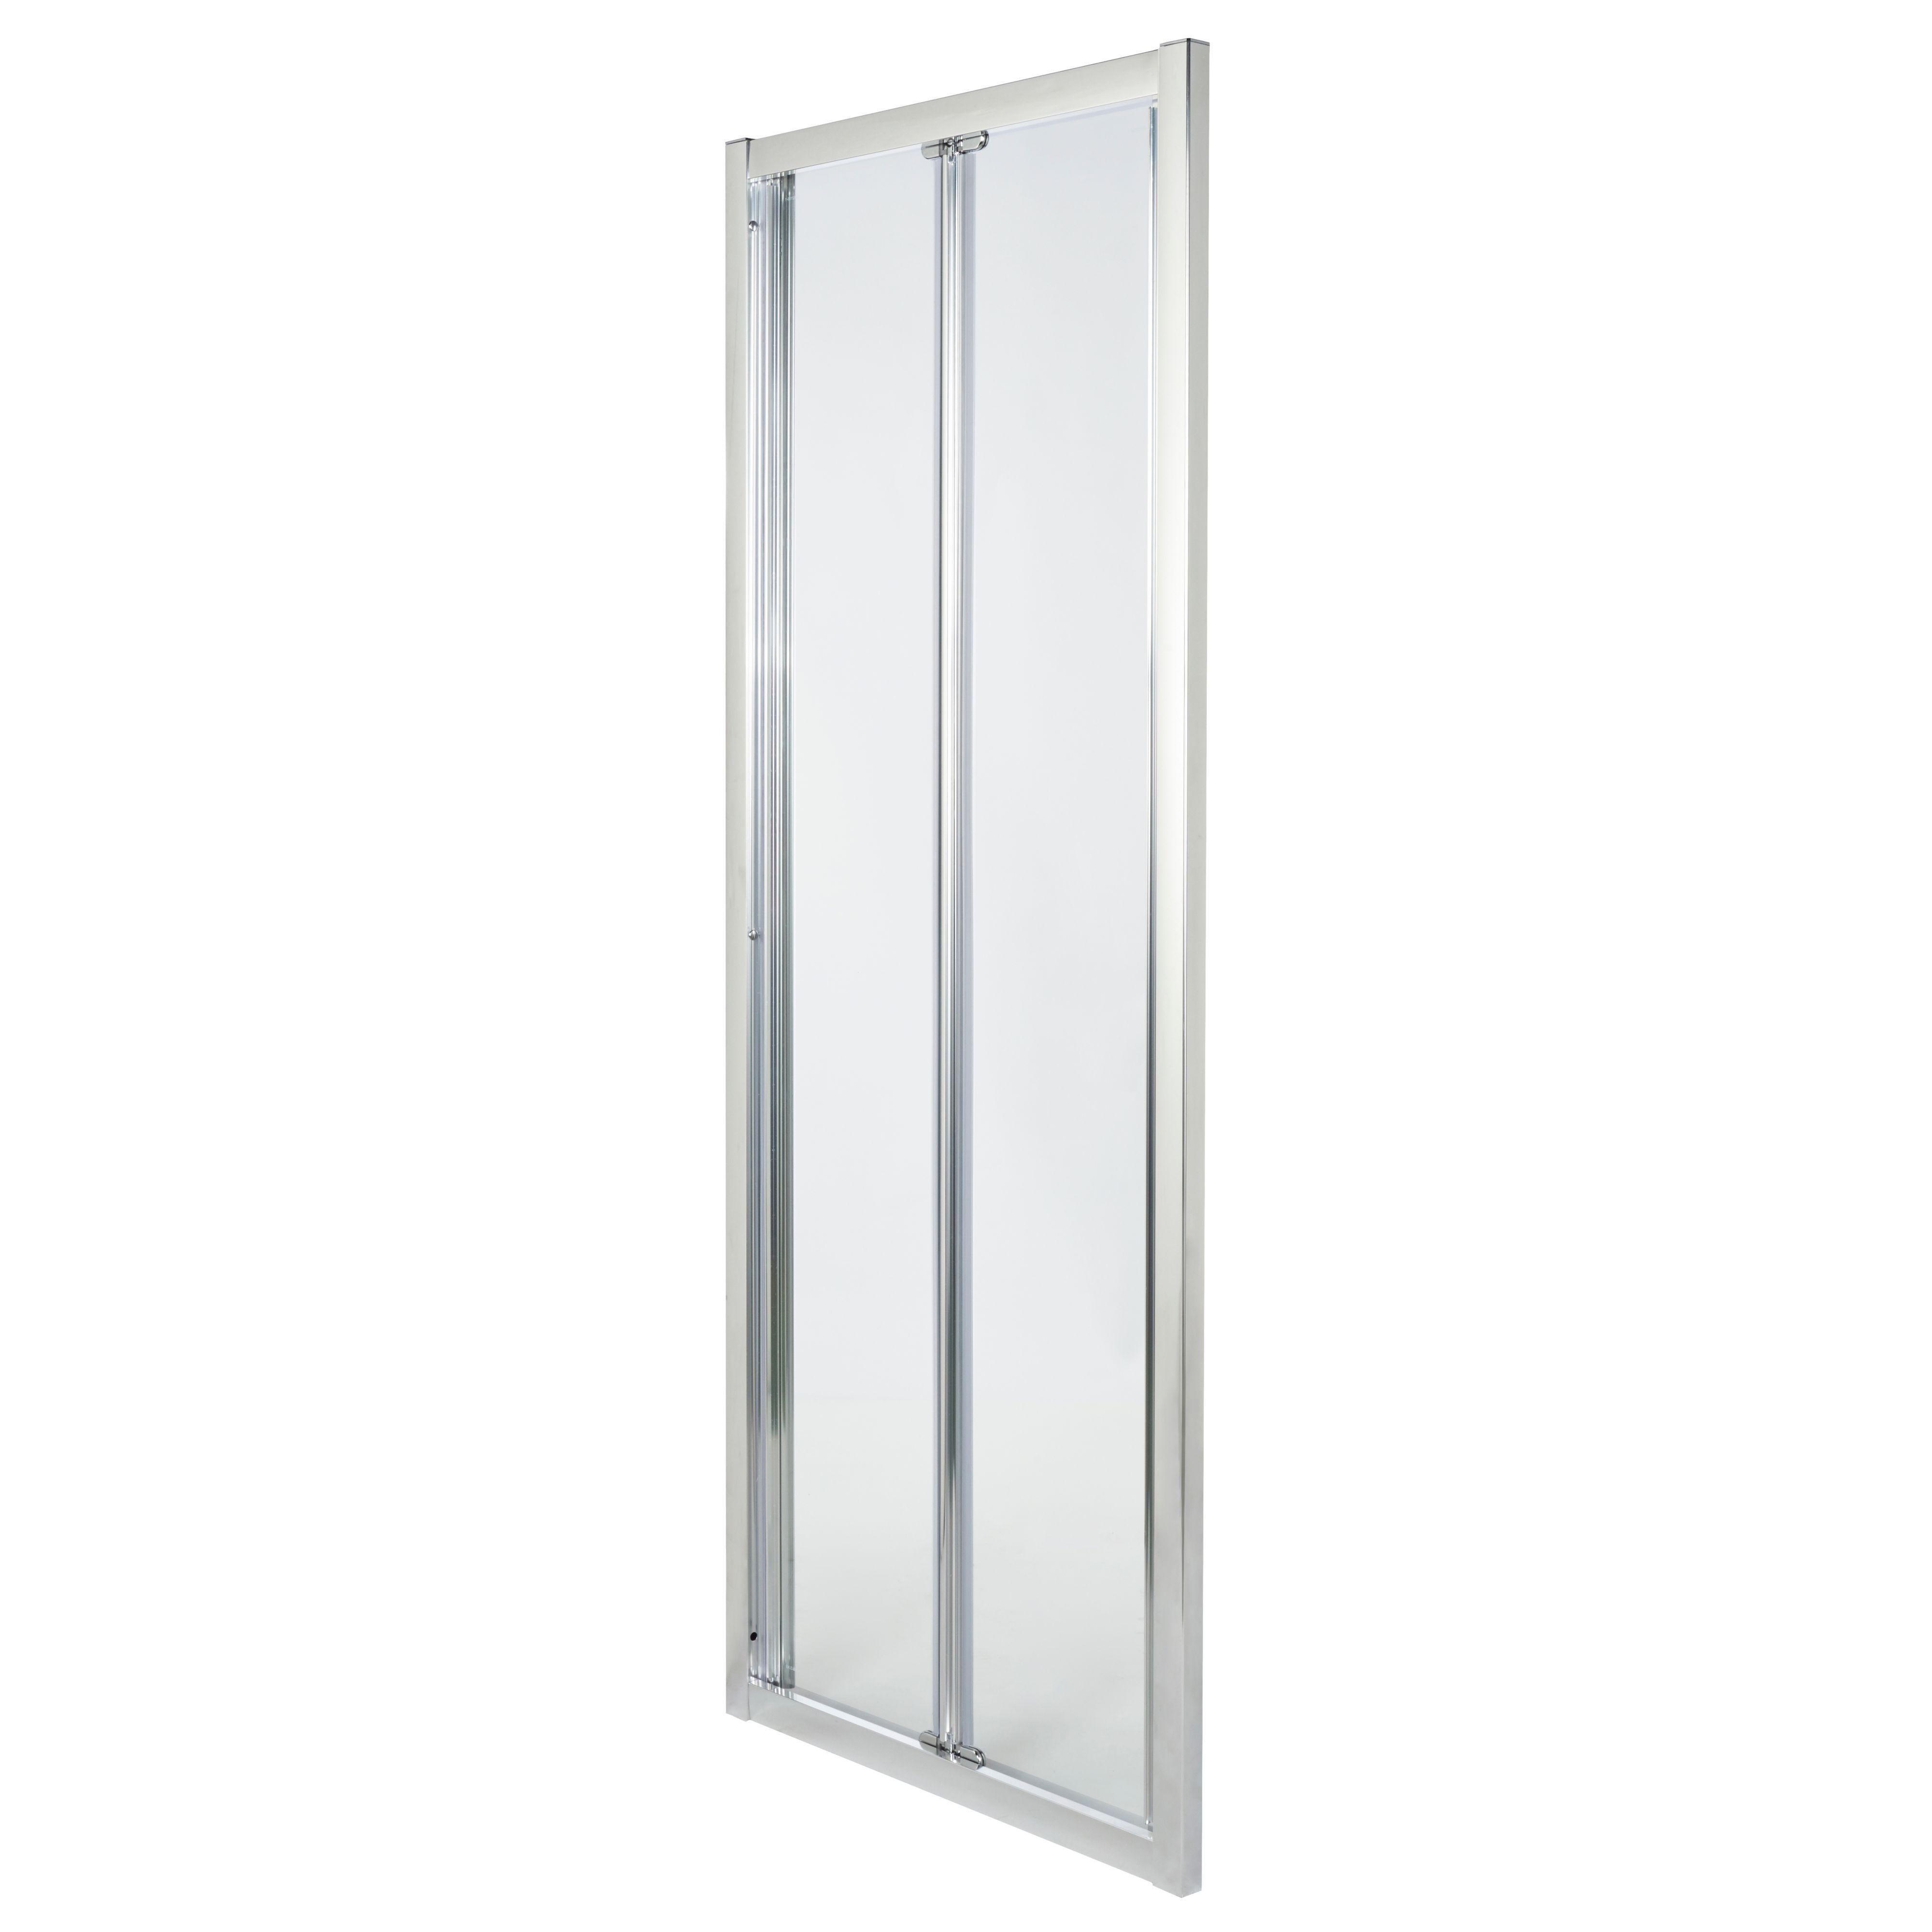 Cooke & Lewis Onega Bi-fold Shower Door (w)760mm